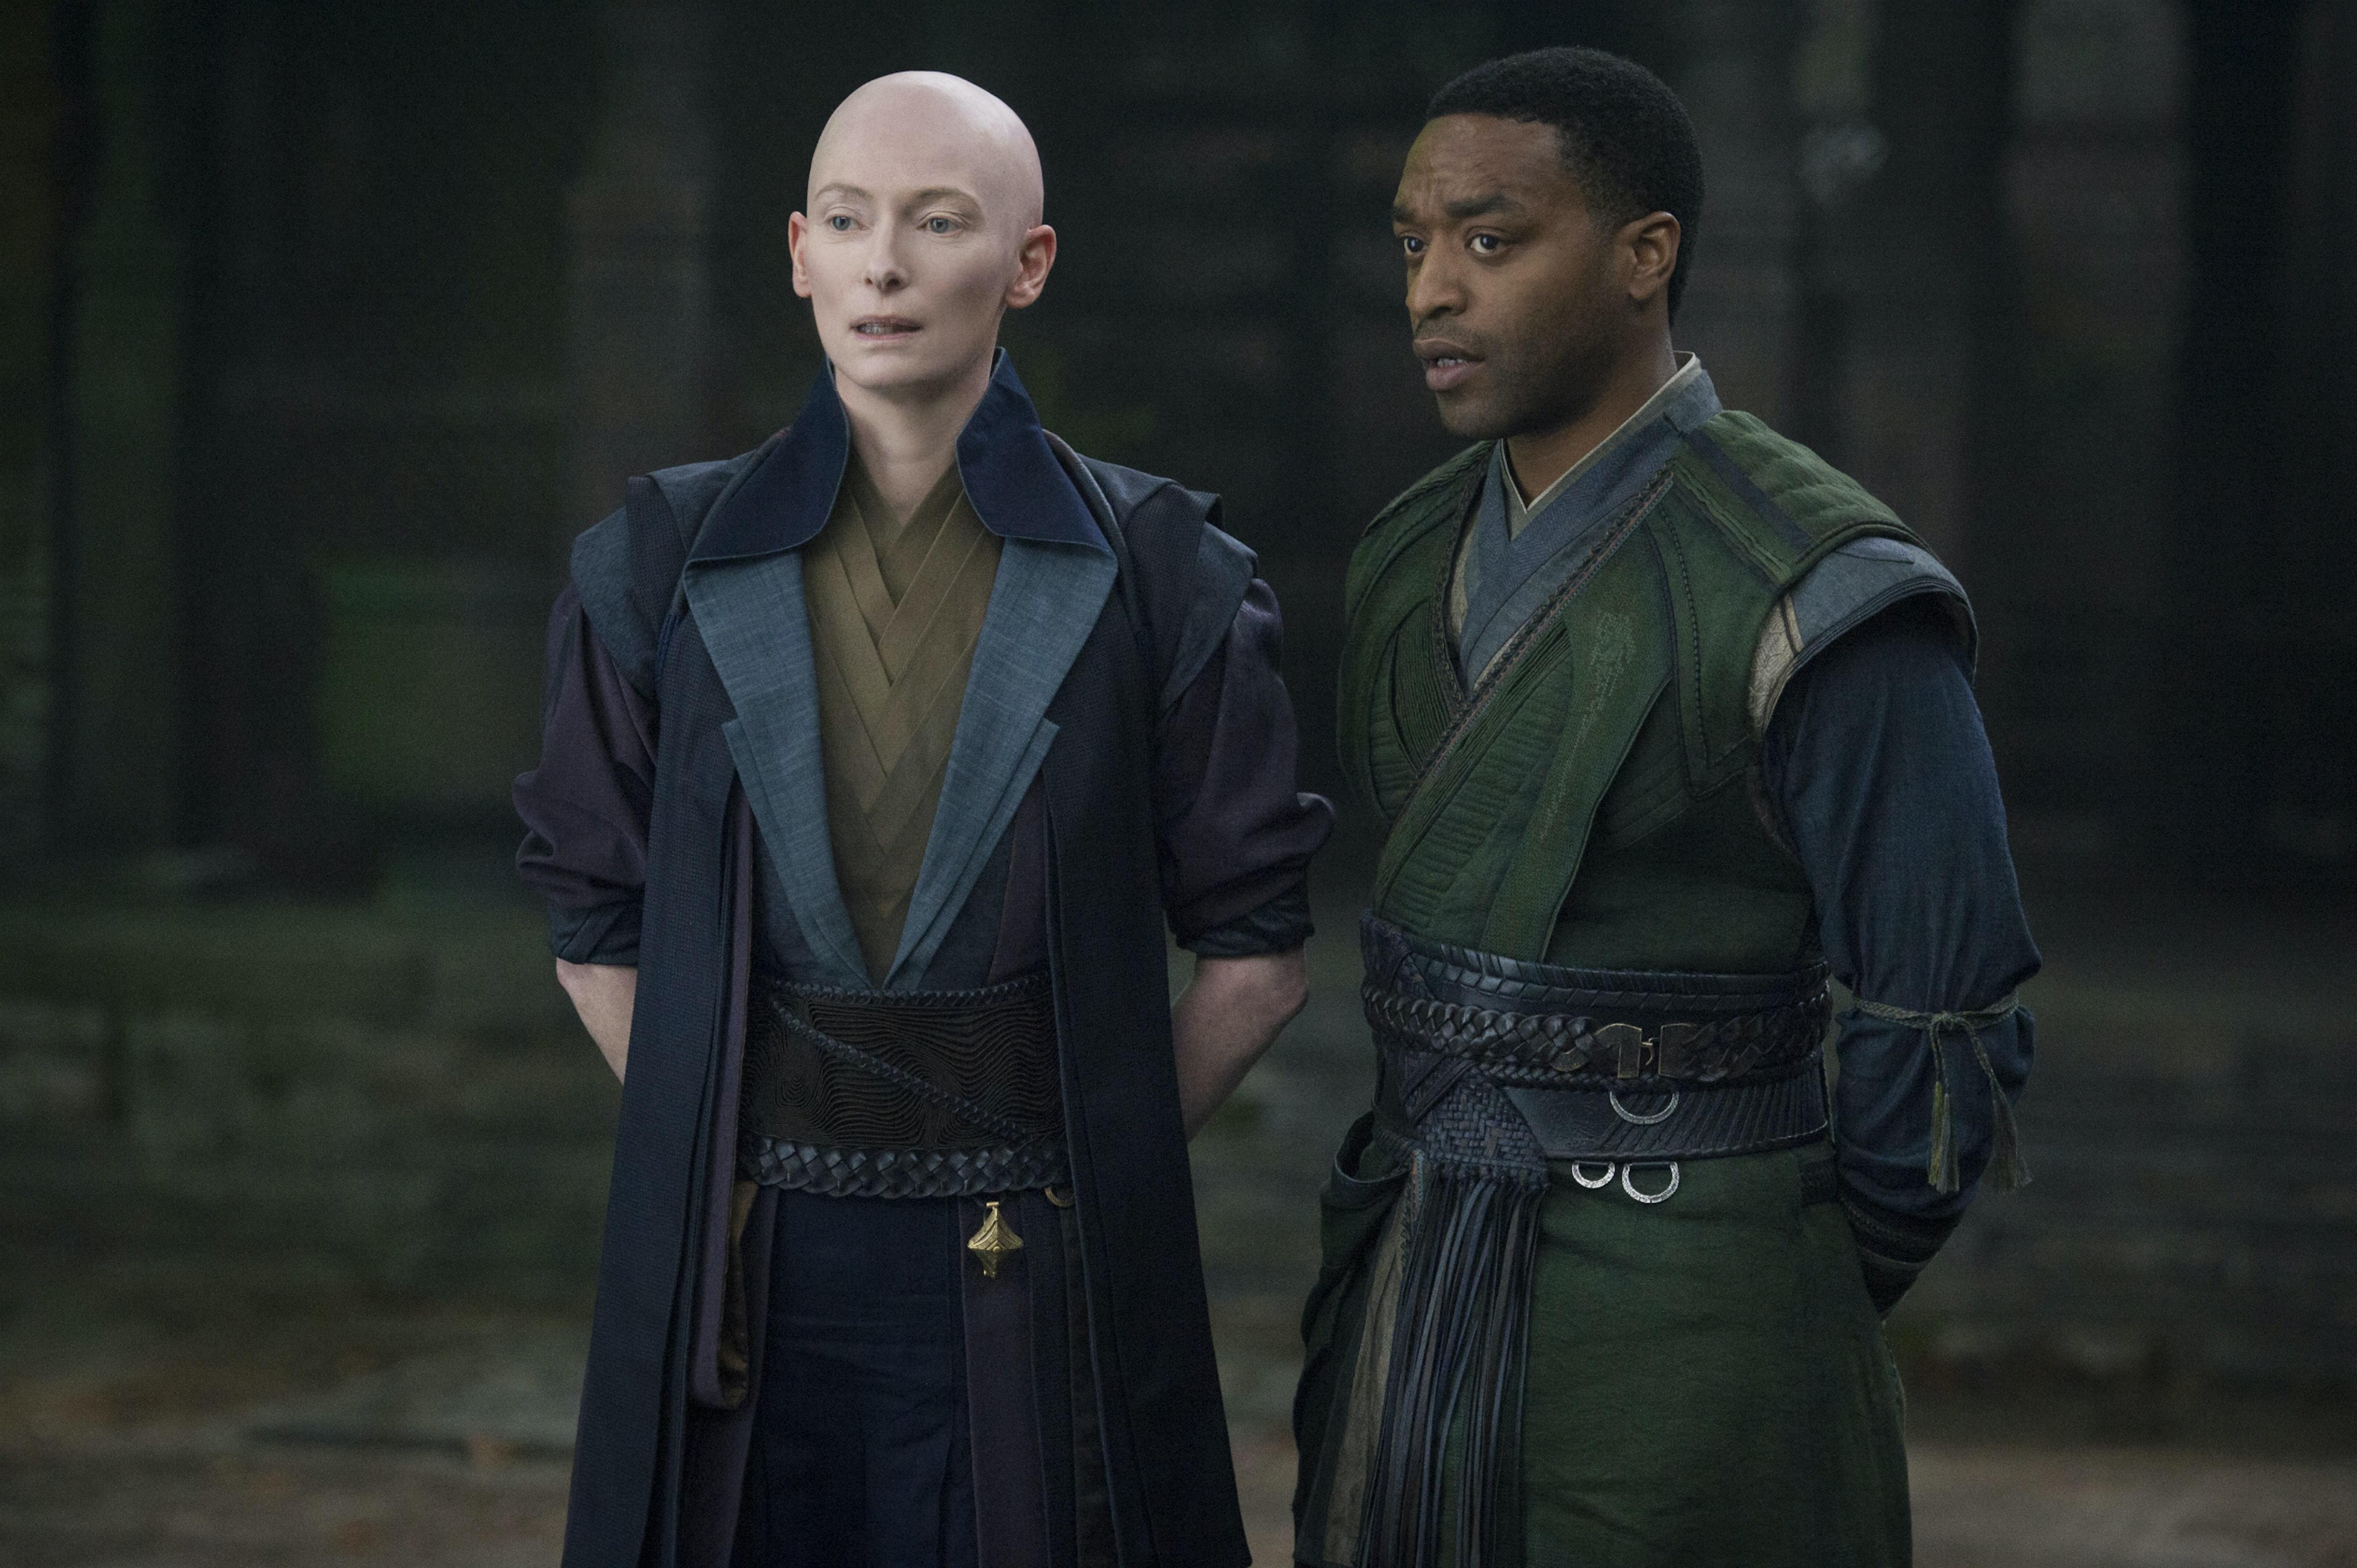 Tilda Swinton as the Ancient One, Chiwetel Ejiofor as Karl Mordo